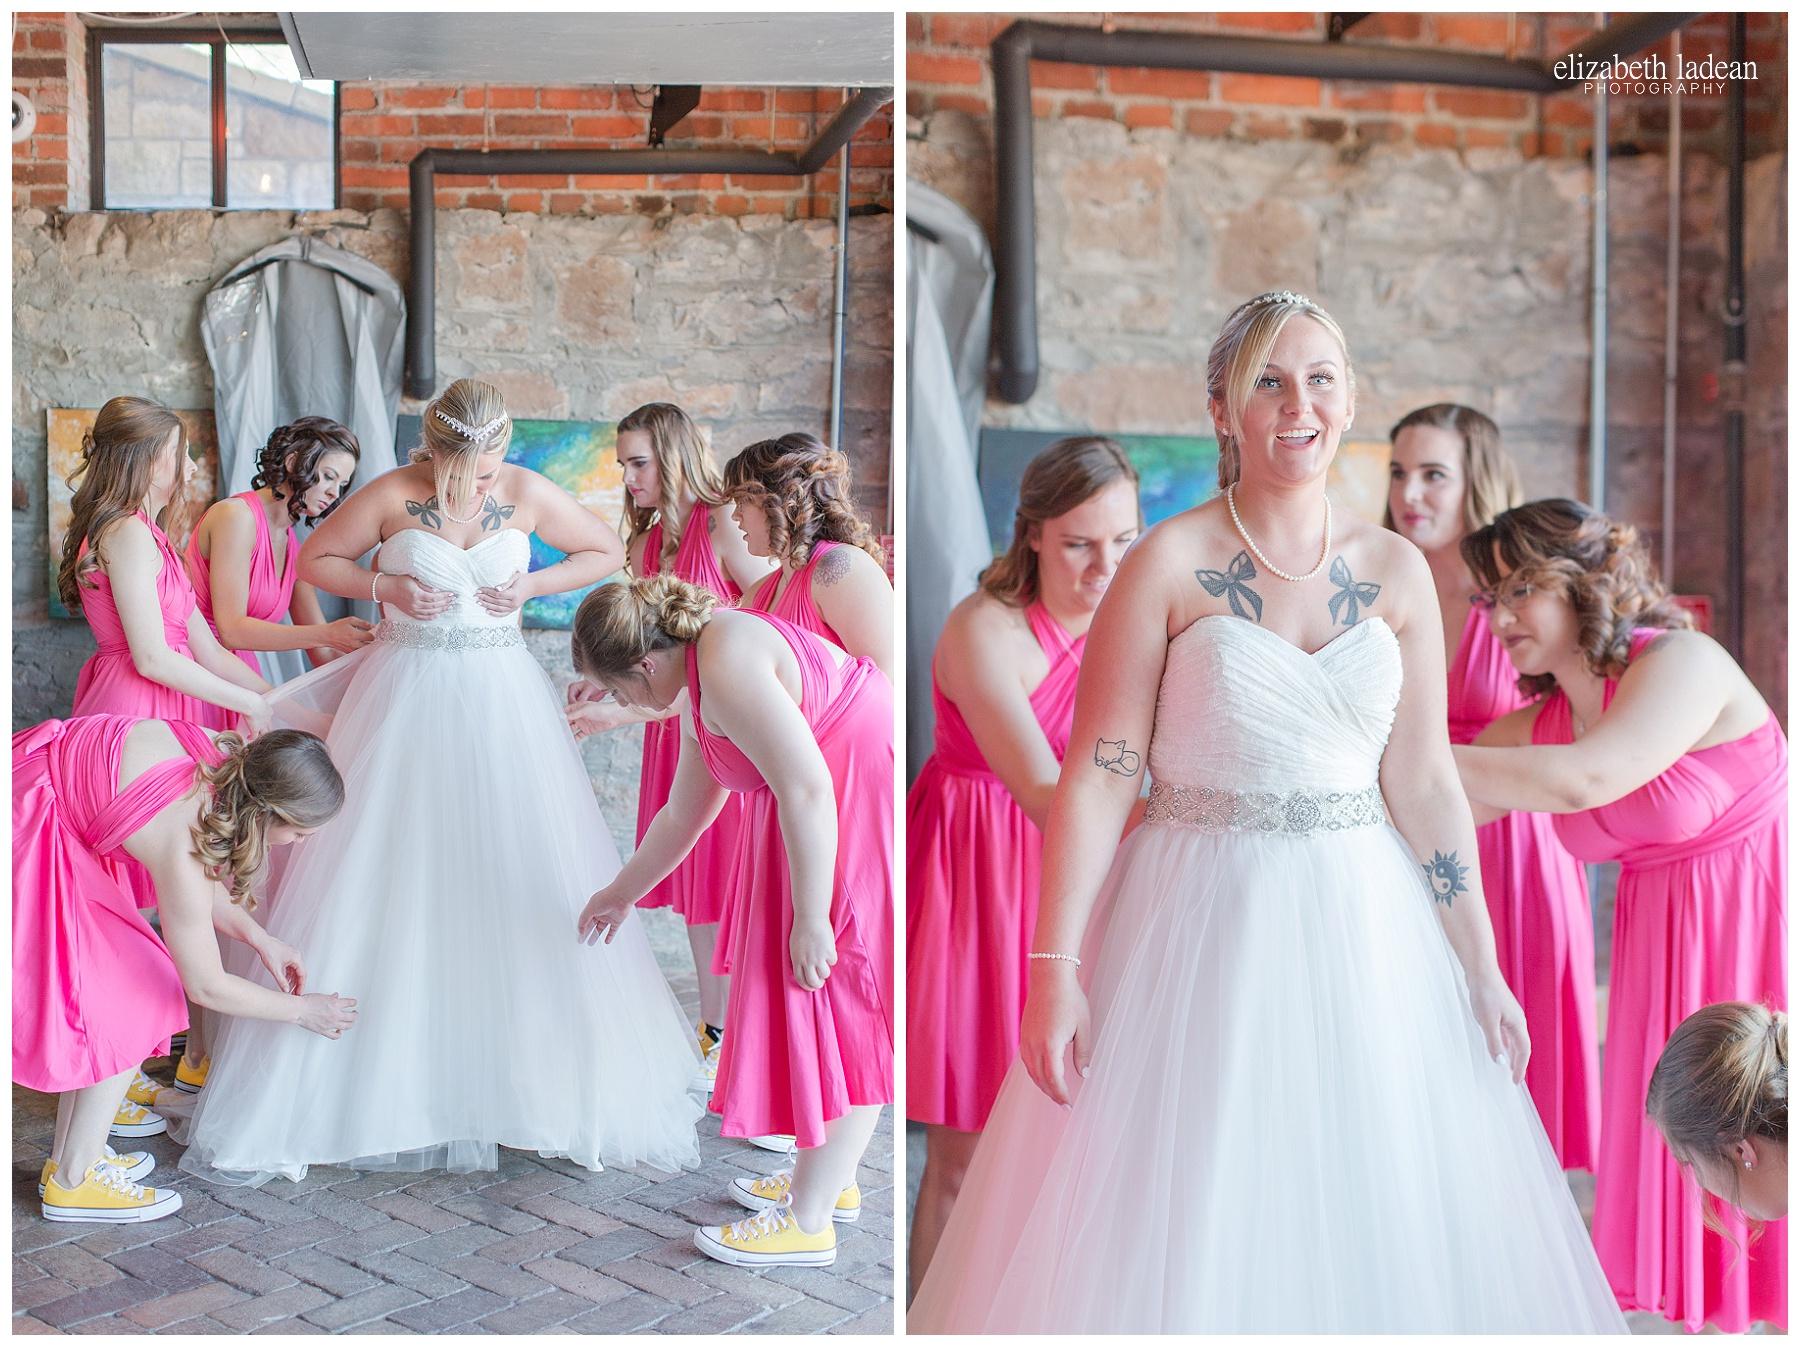 Thompson-Barn-Kansas-Wedding-Photography-R+J-0505-Elizabeth-Ladean-Photography-photo_0673.jpg